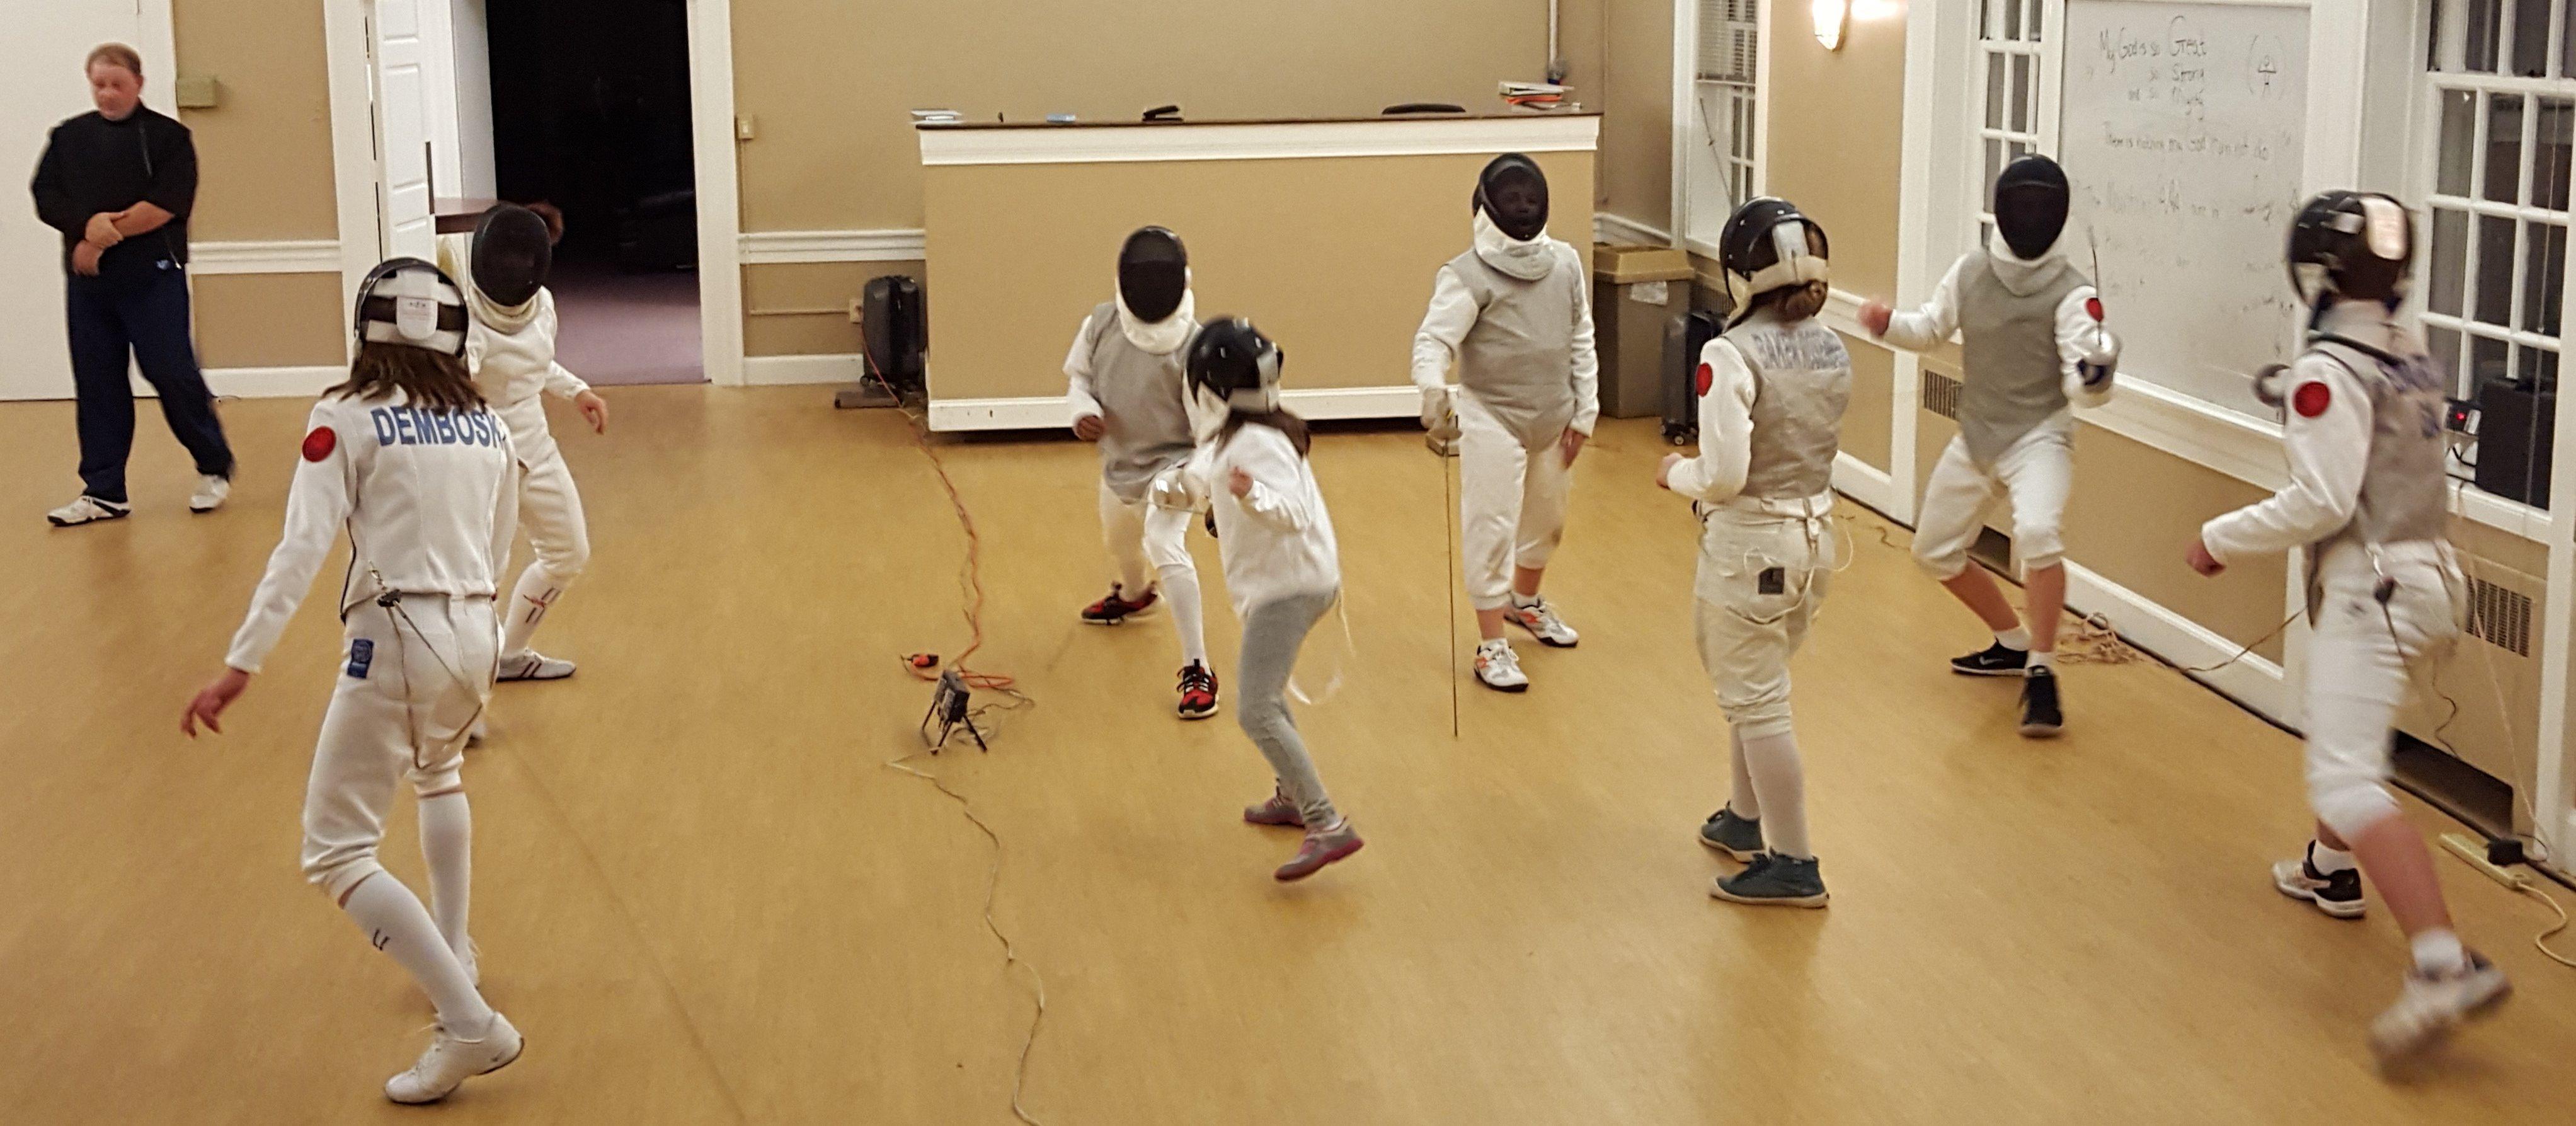 Nova Fencing Club Coupons Near Me In Falls Church 8coupons